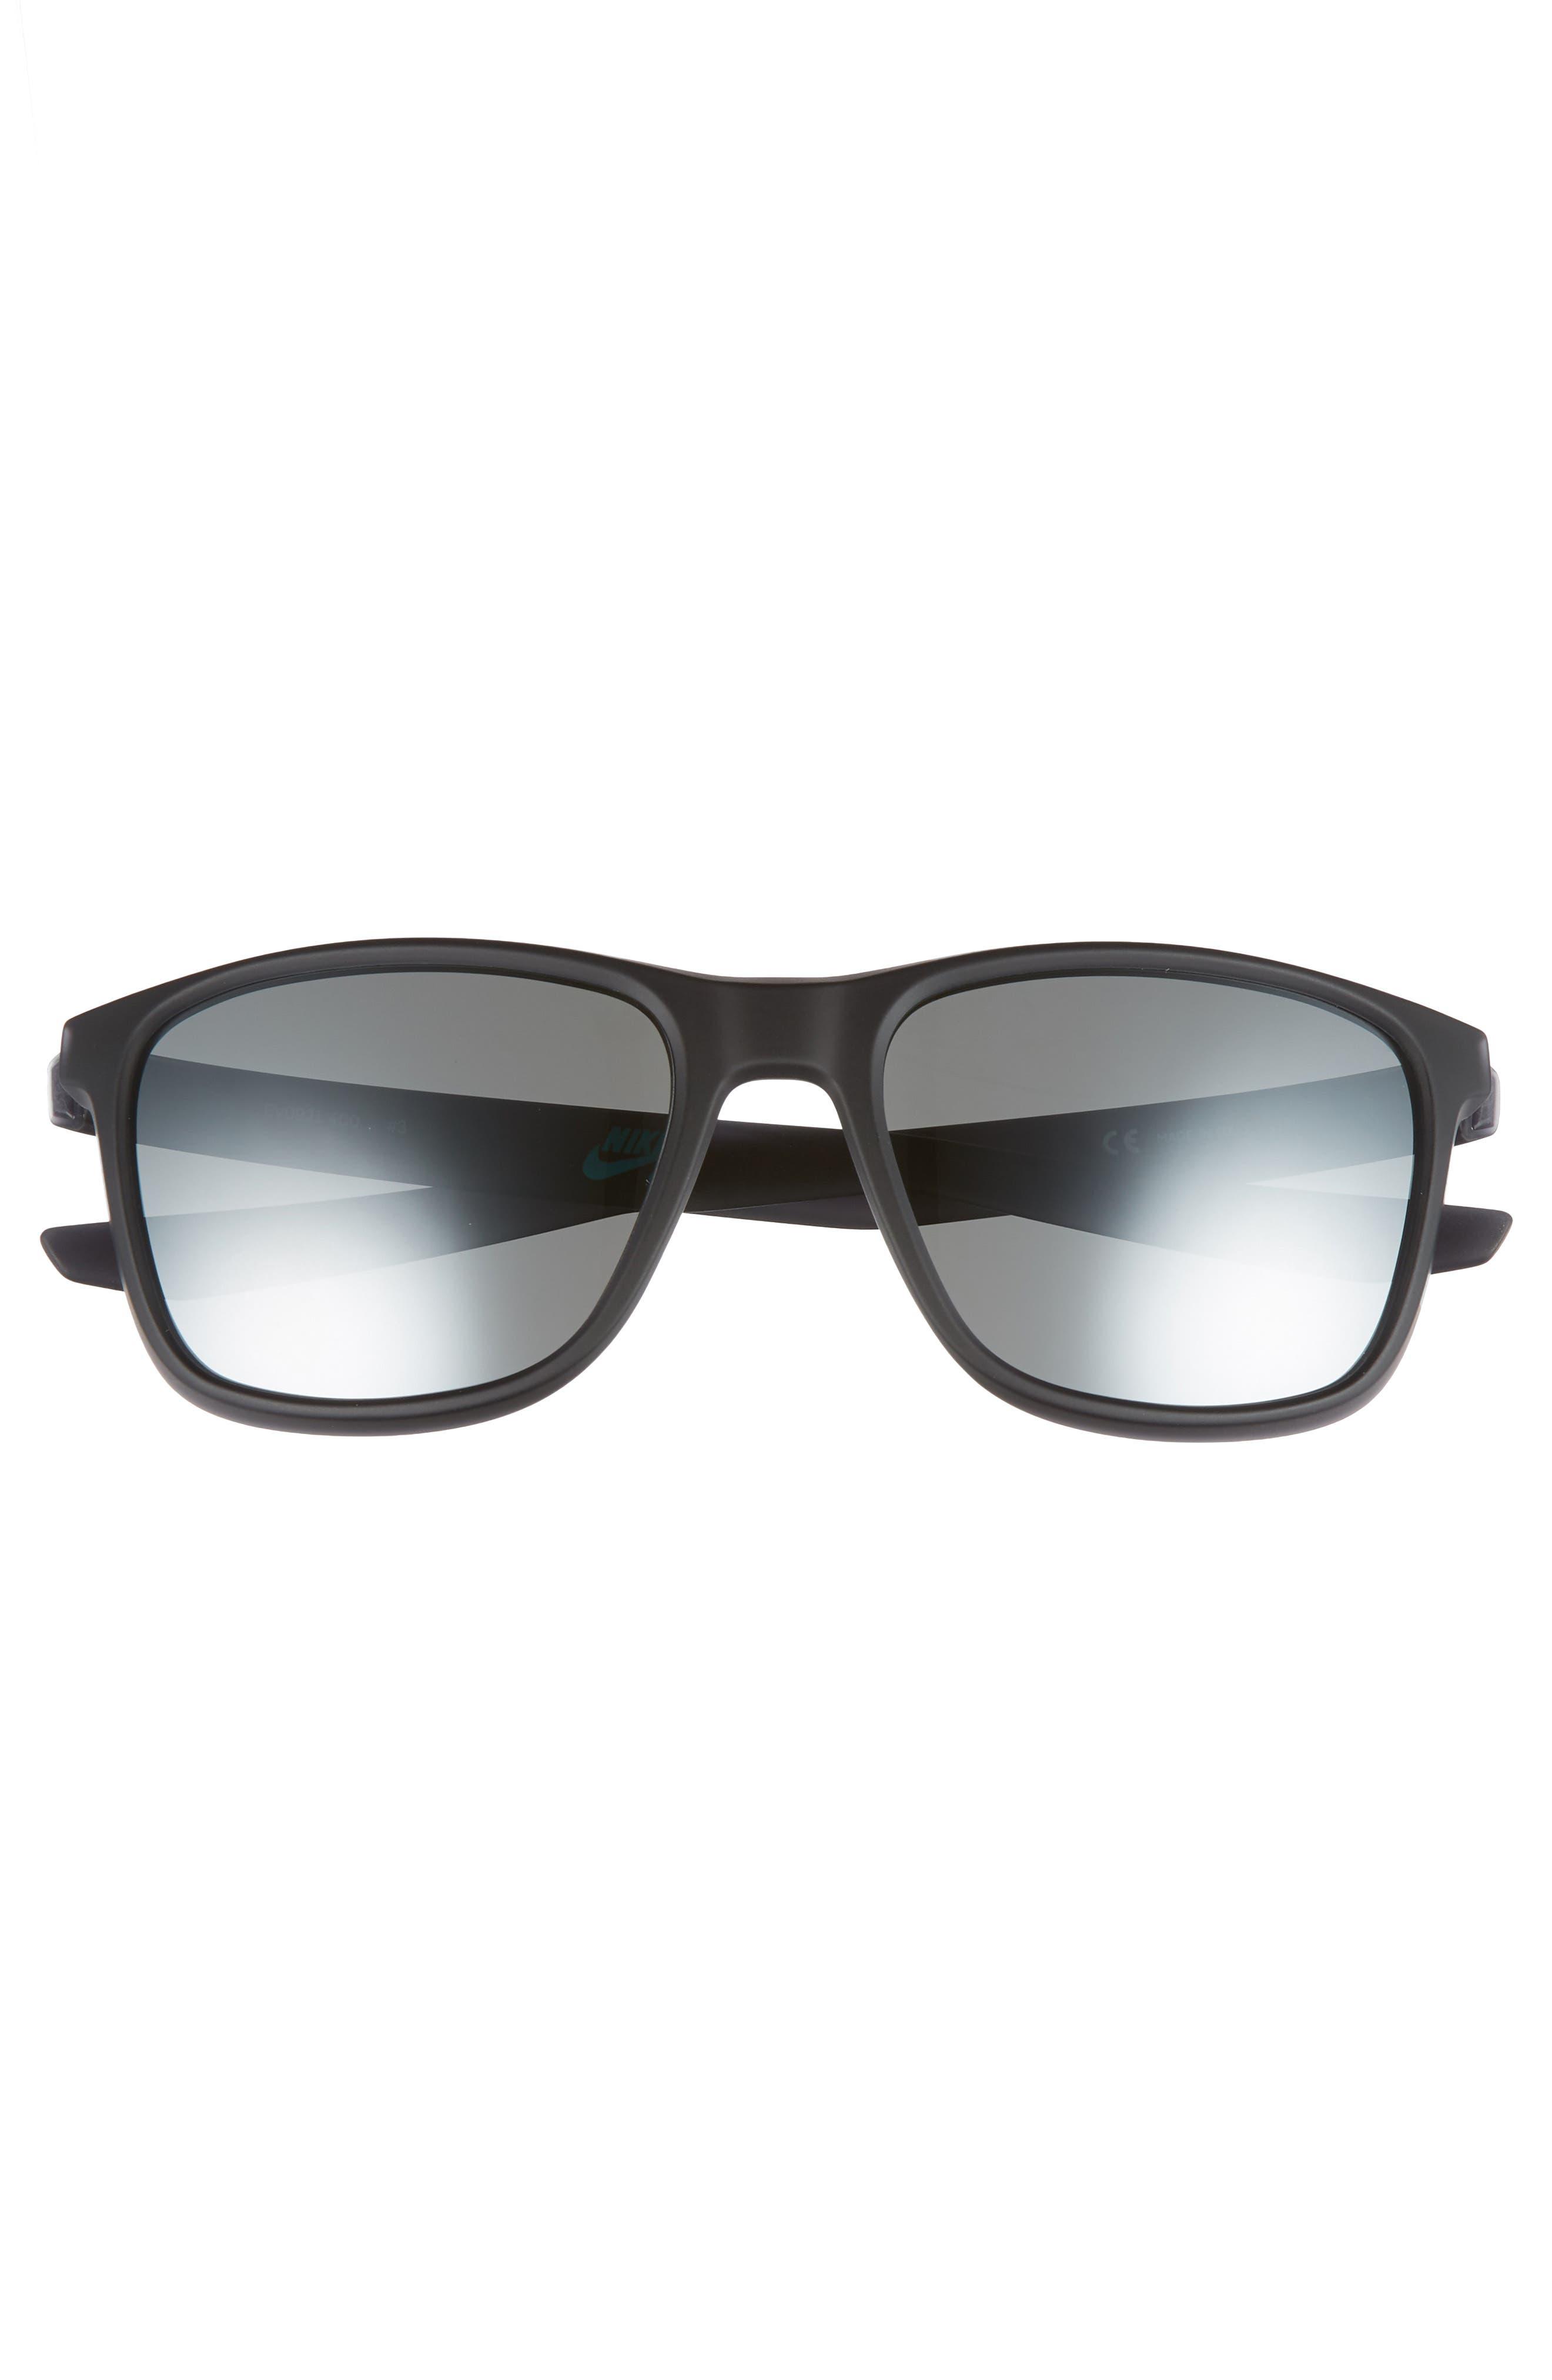 NIKE, Unrest 57mm Sunglasses, Alternate thumbnail 3, color, MATTE OBSIDIAN/ GREY SILVER